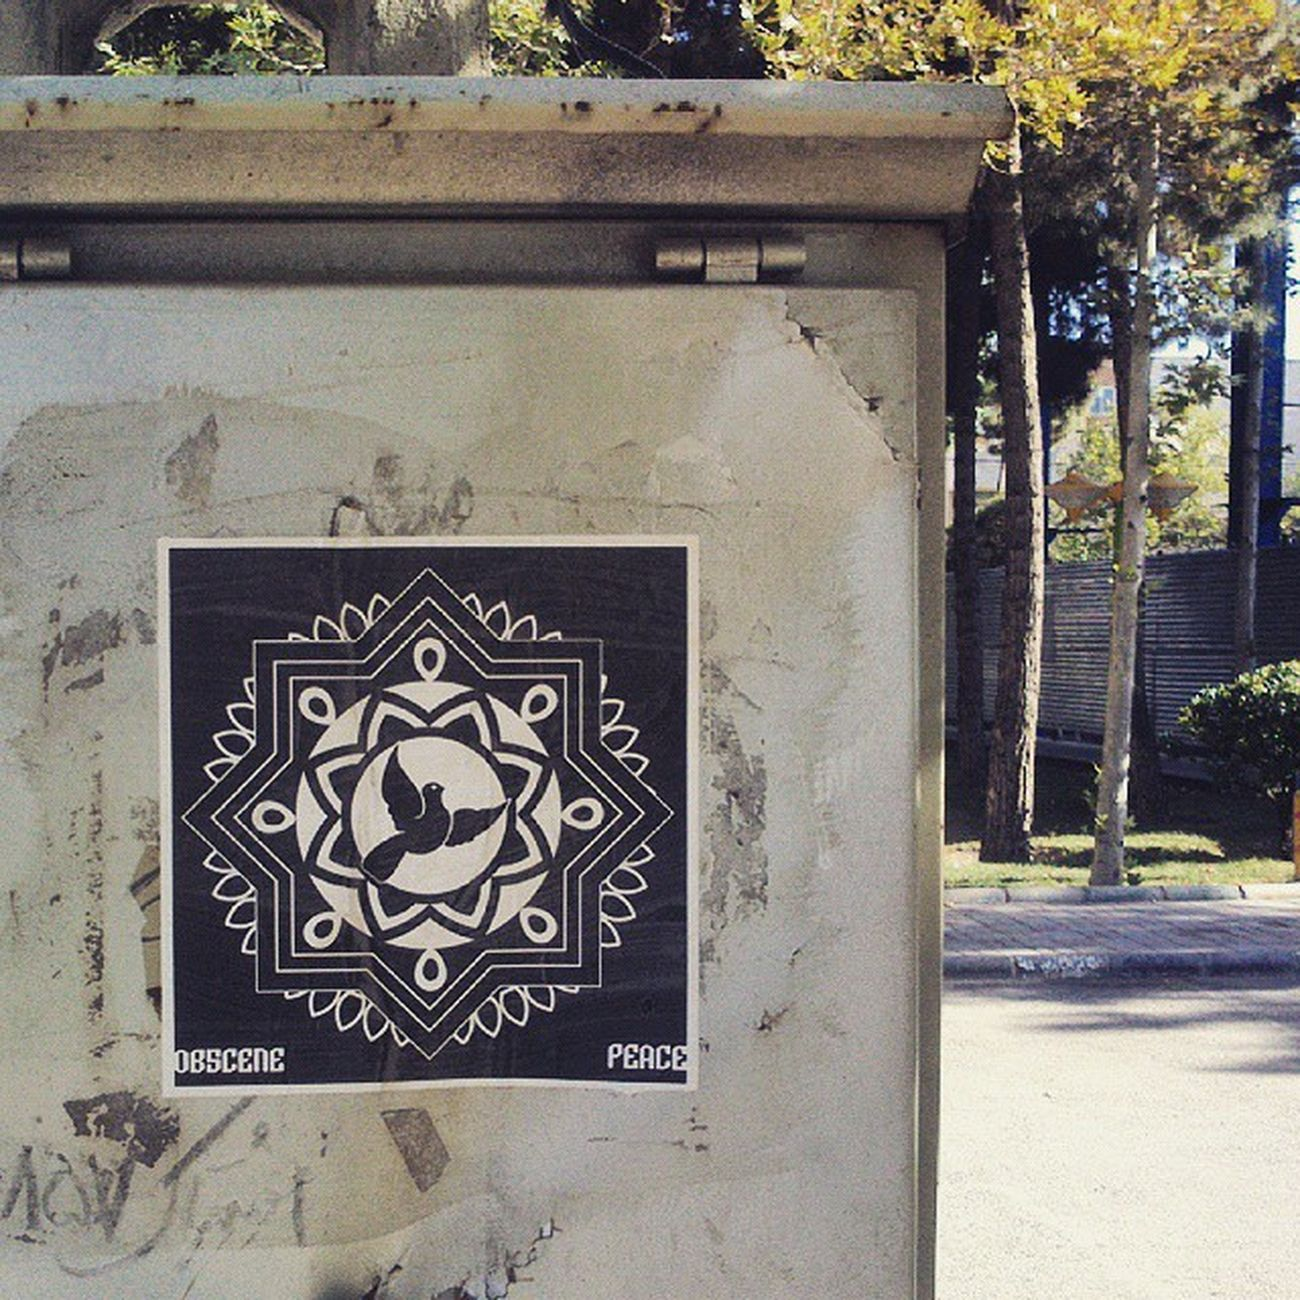 Electricitypost Ob5cene Streetart UrbanART Pasteup Wheatpasteart Art Peace